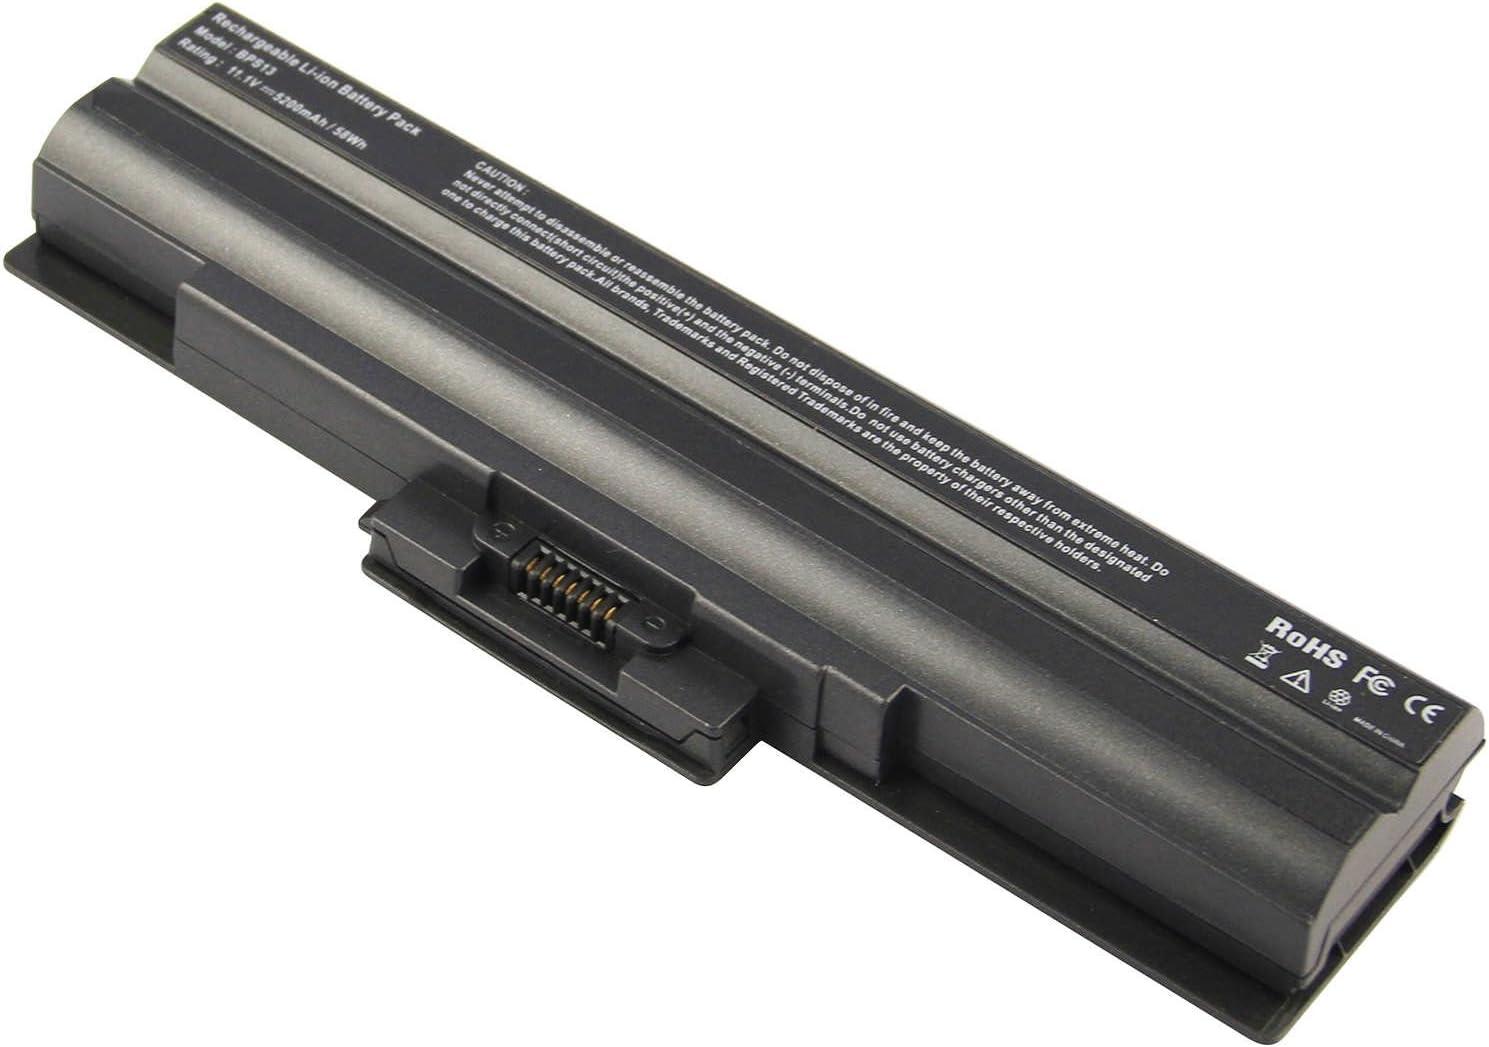 Laptop Battery for Sony Vaio VGP-BPS13 VGP-BPS13A VGP-BPS13A/B VGP-BPS13B/S VGP-BPL13 PCG-81214L PCG-81114L - 12 Months Warranty [Black 6 Cells 11.1V 5200mAh]